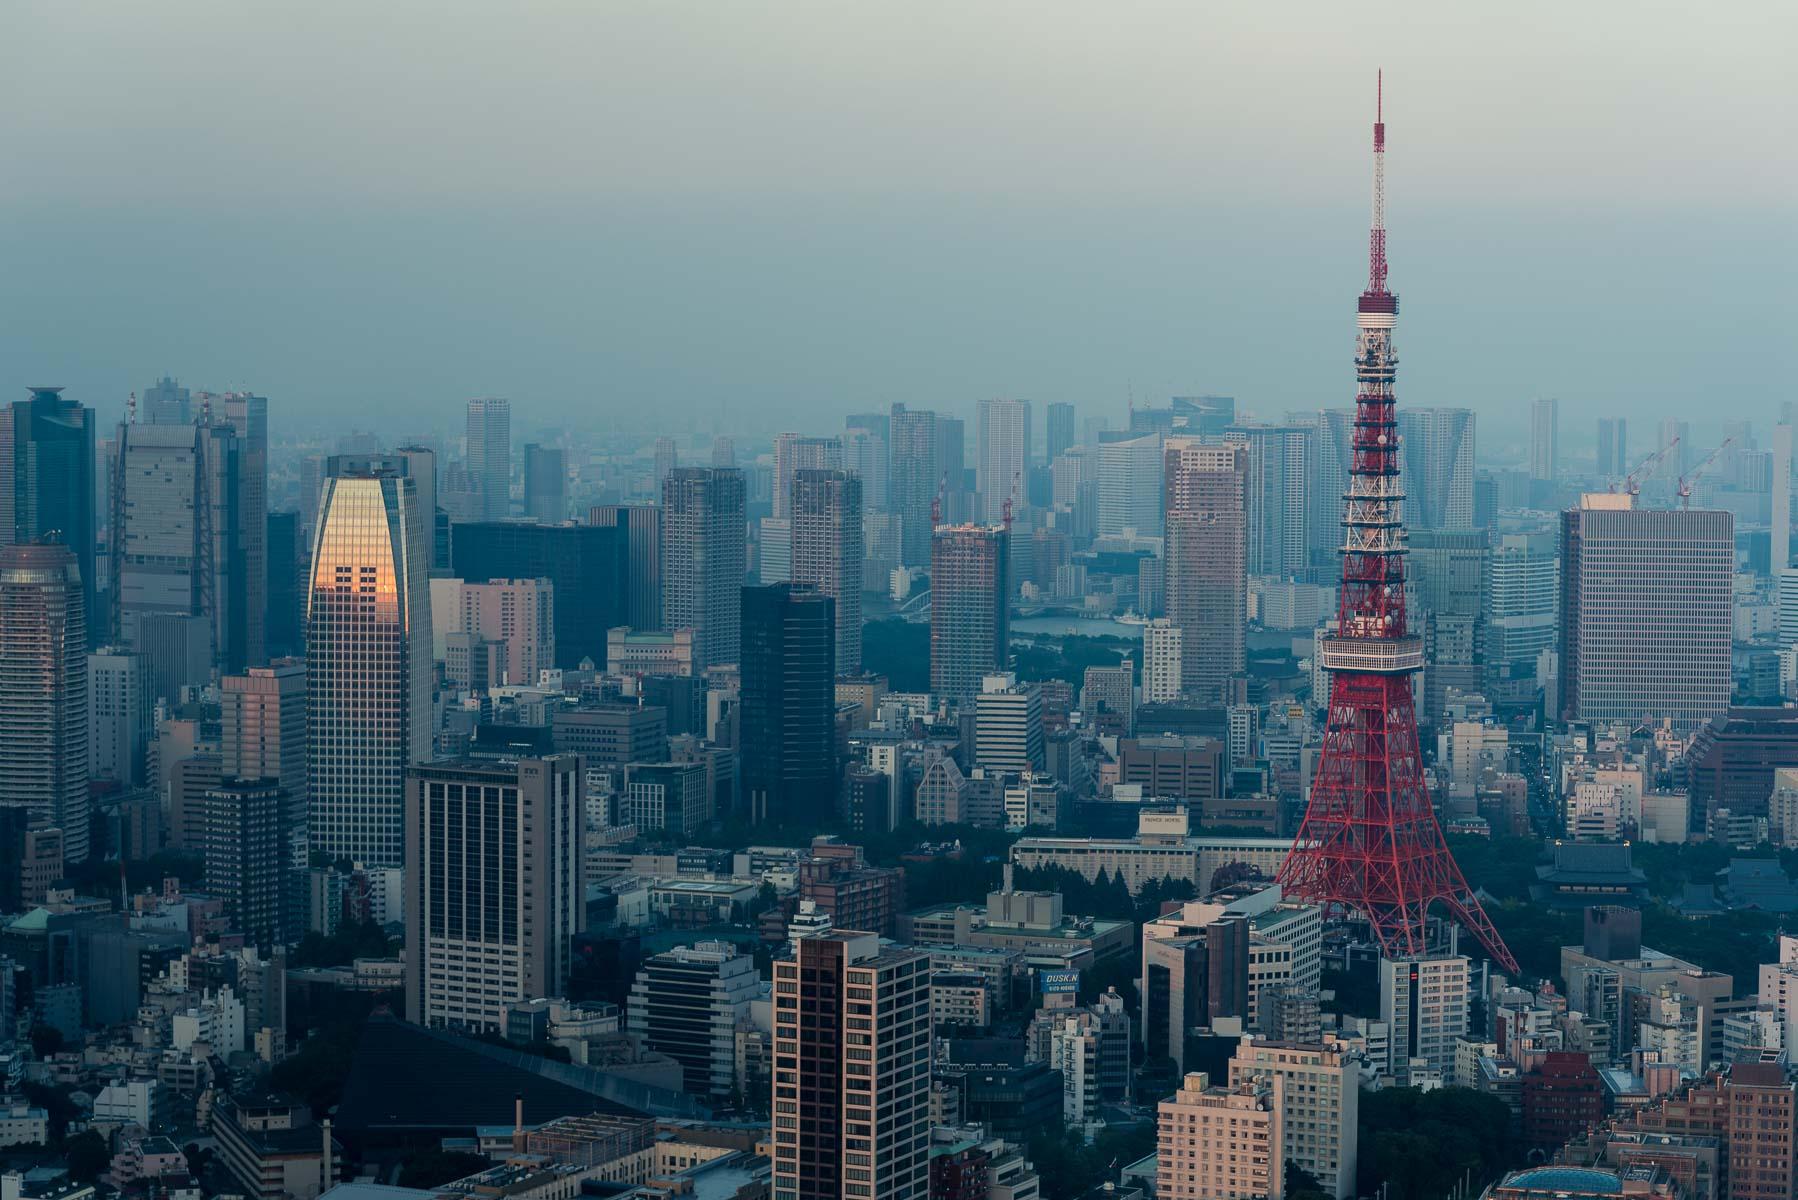 Christian Meixner Fotografie, Fotograf Zürich, Japan, Tokyo, Reisen, Reisefotografie